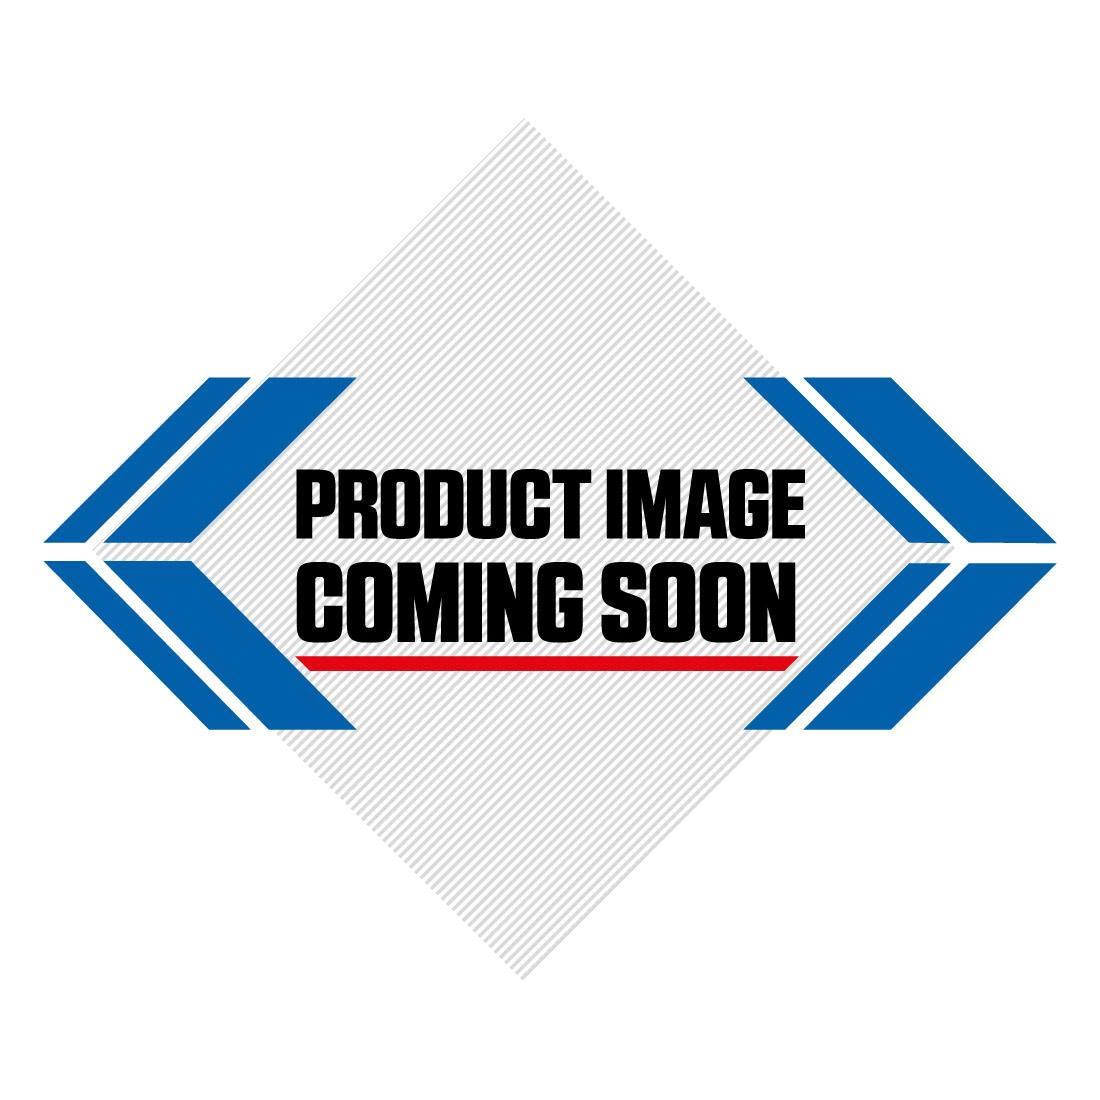 UFO KTM Plastic Kit SX 125 150 250 SXF 250 350 450 (16-18) OEM 16 Image-2>